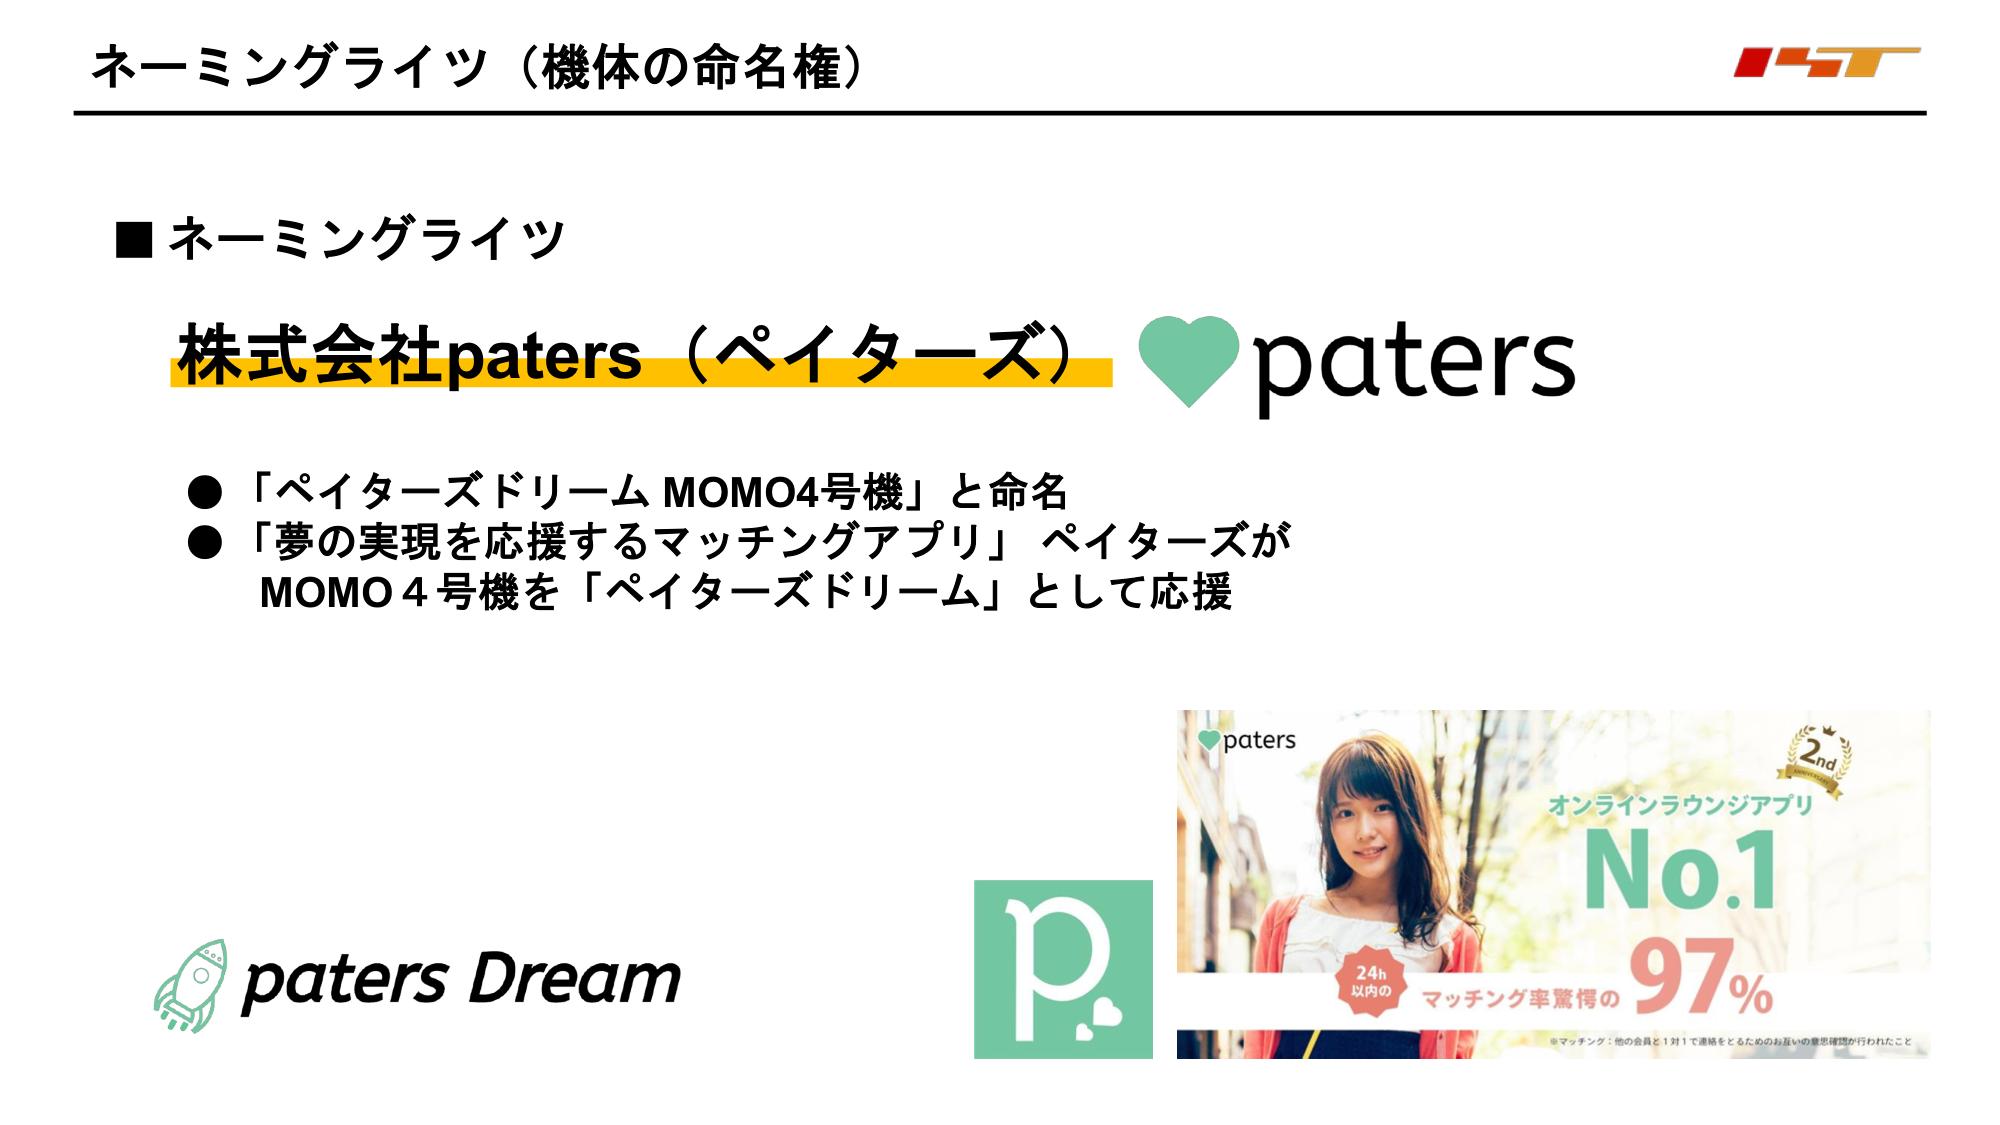 f:id:Imamura:20190628161120p:plain